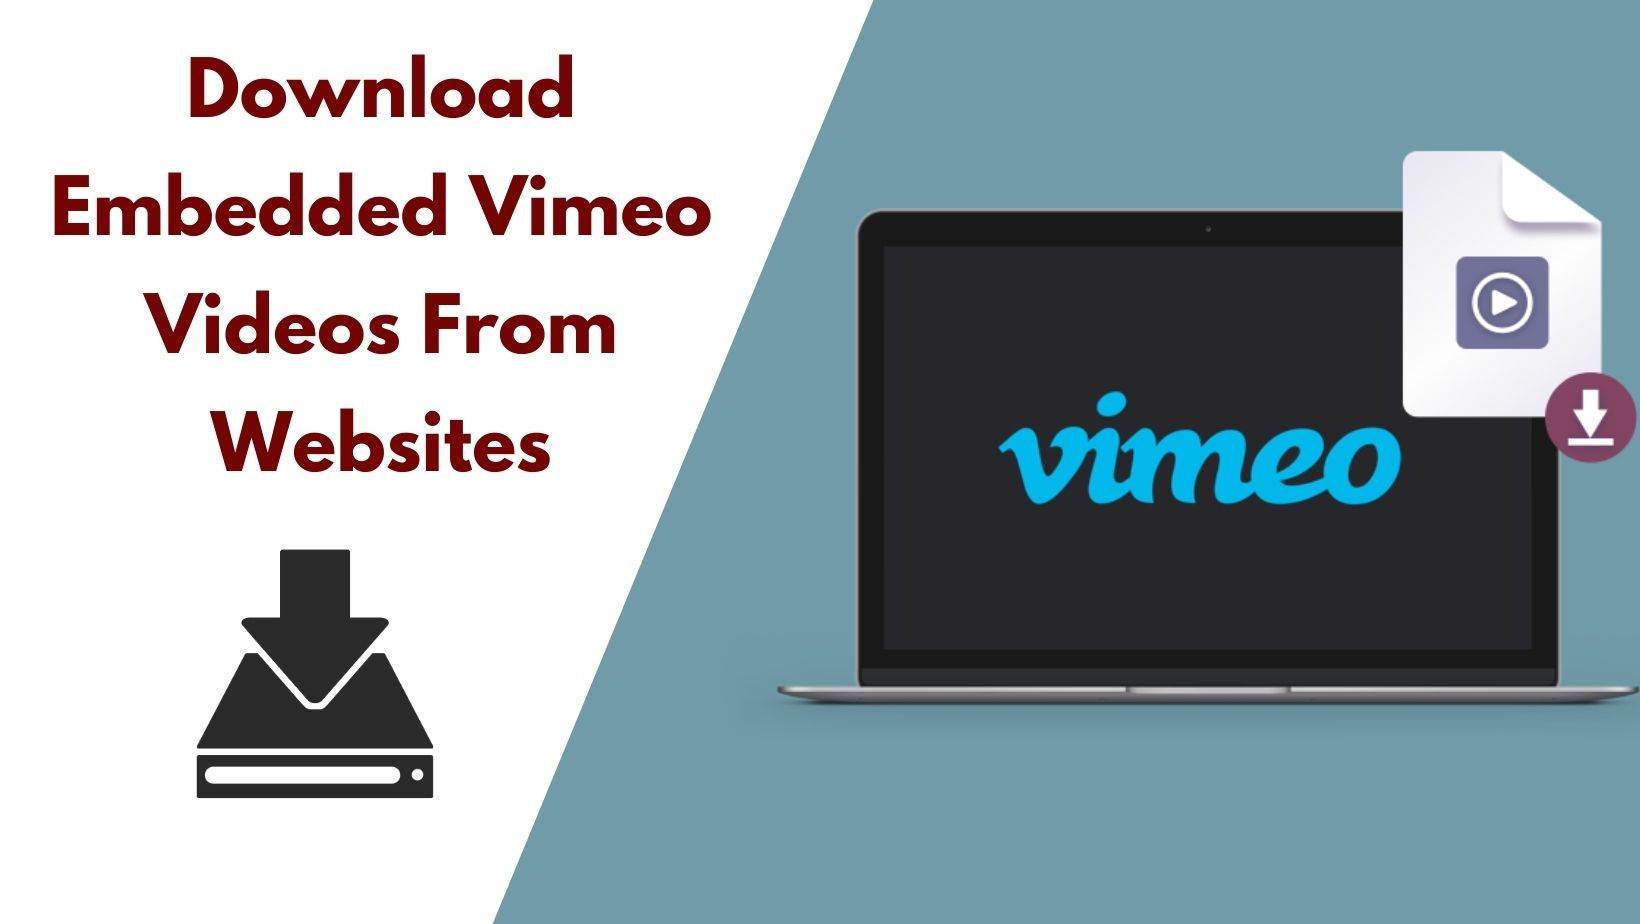 vimeo video download image